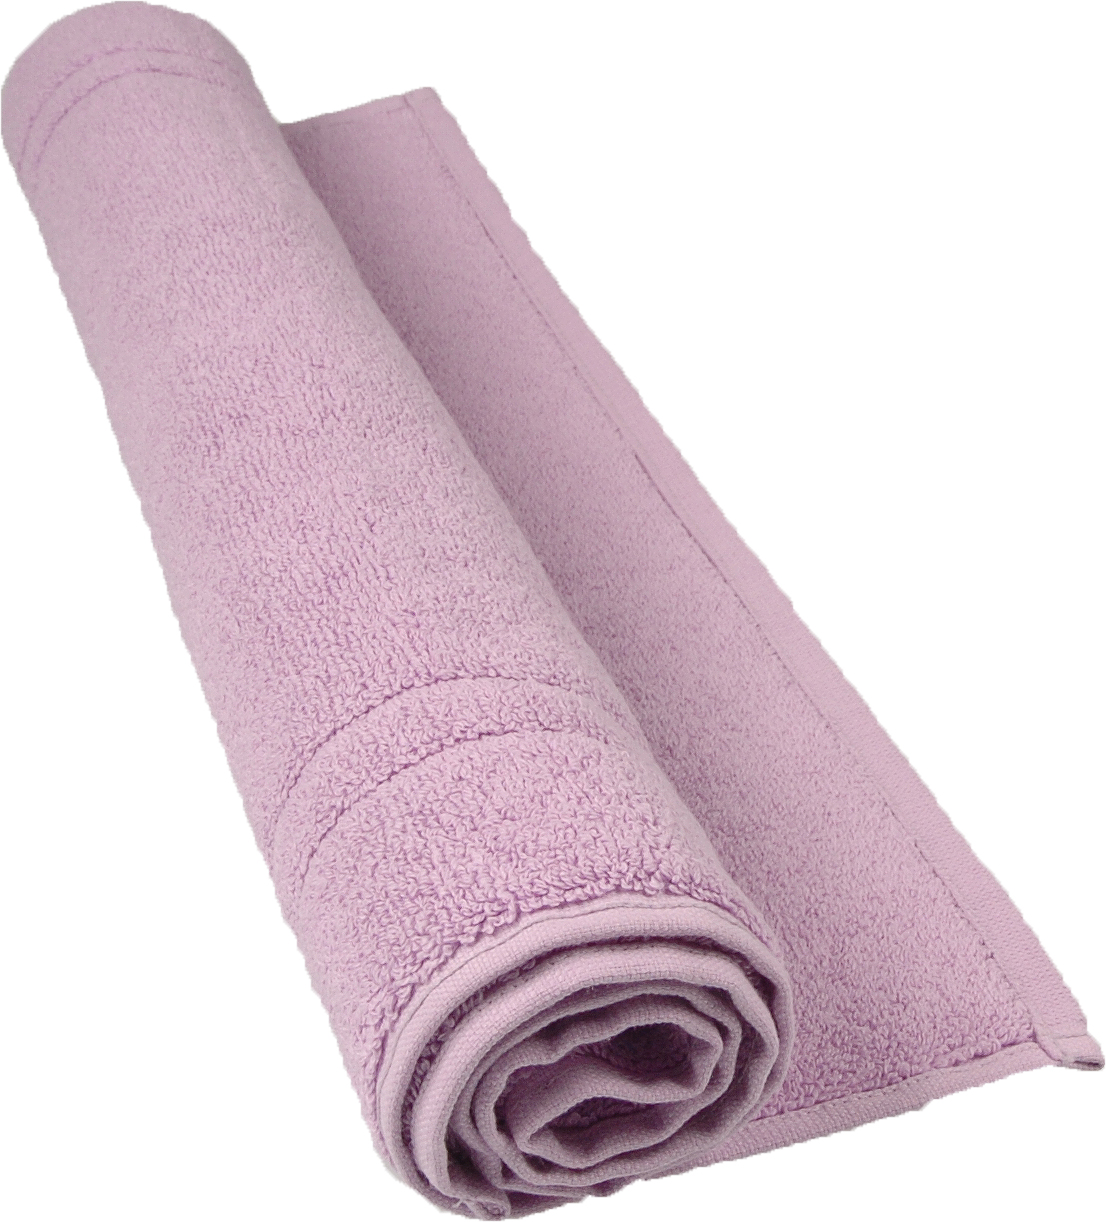 Tapis de bain coton   homemaison : vente en ligne de tapis de bain ...